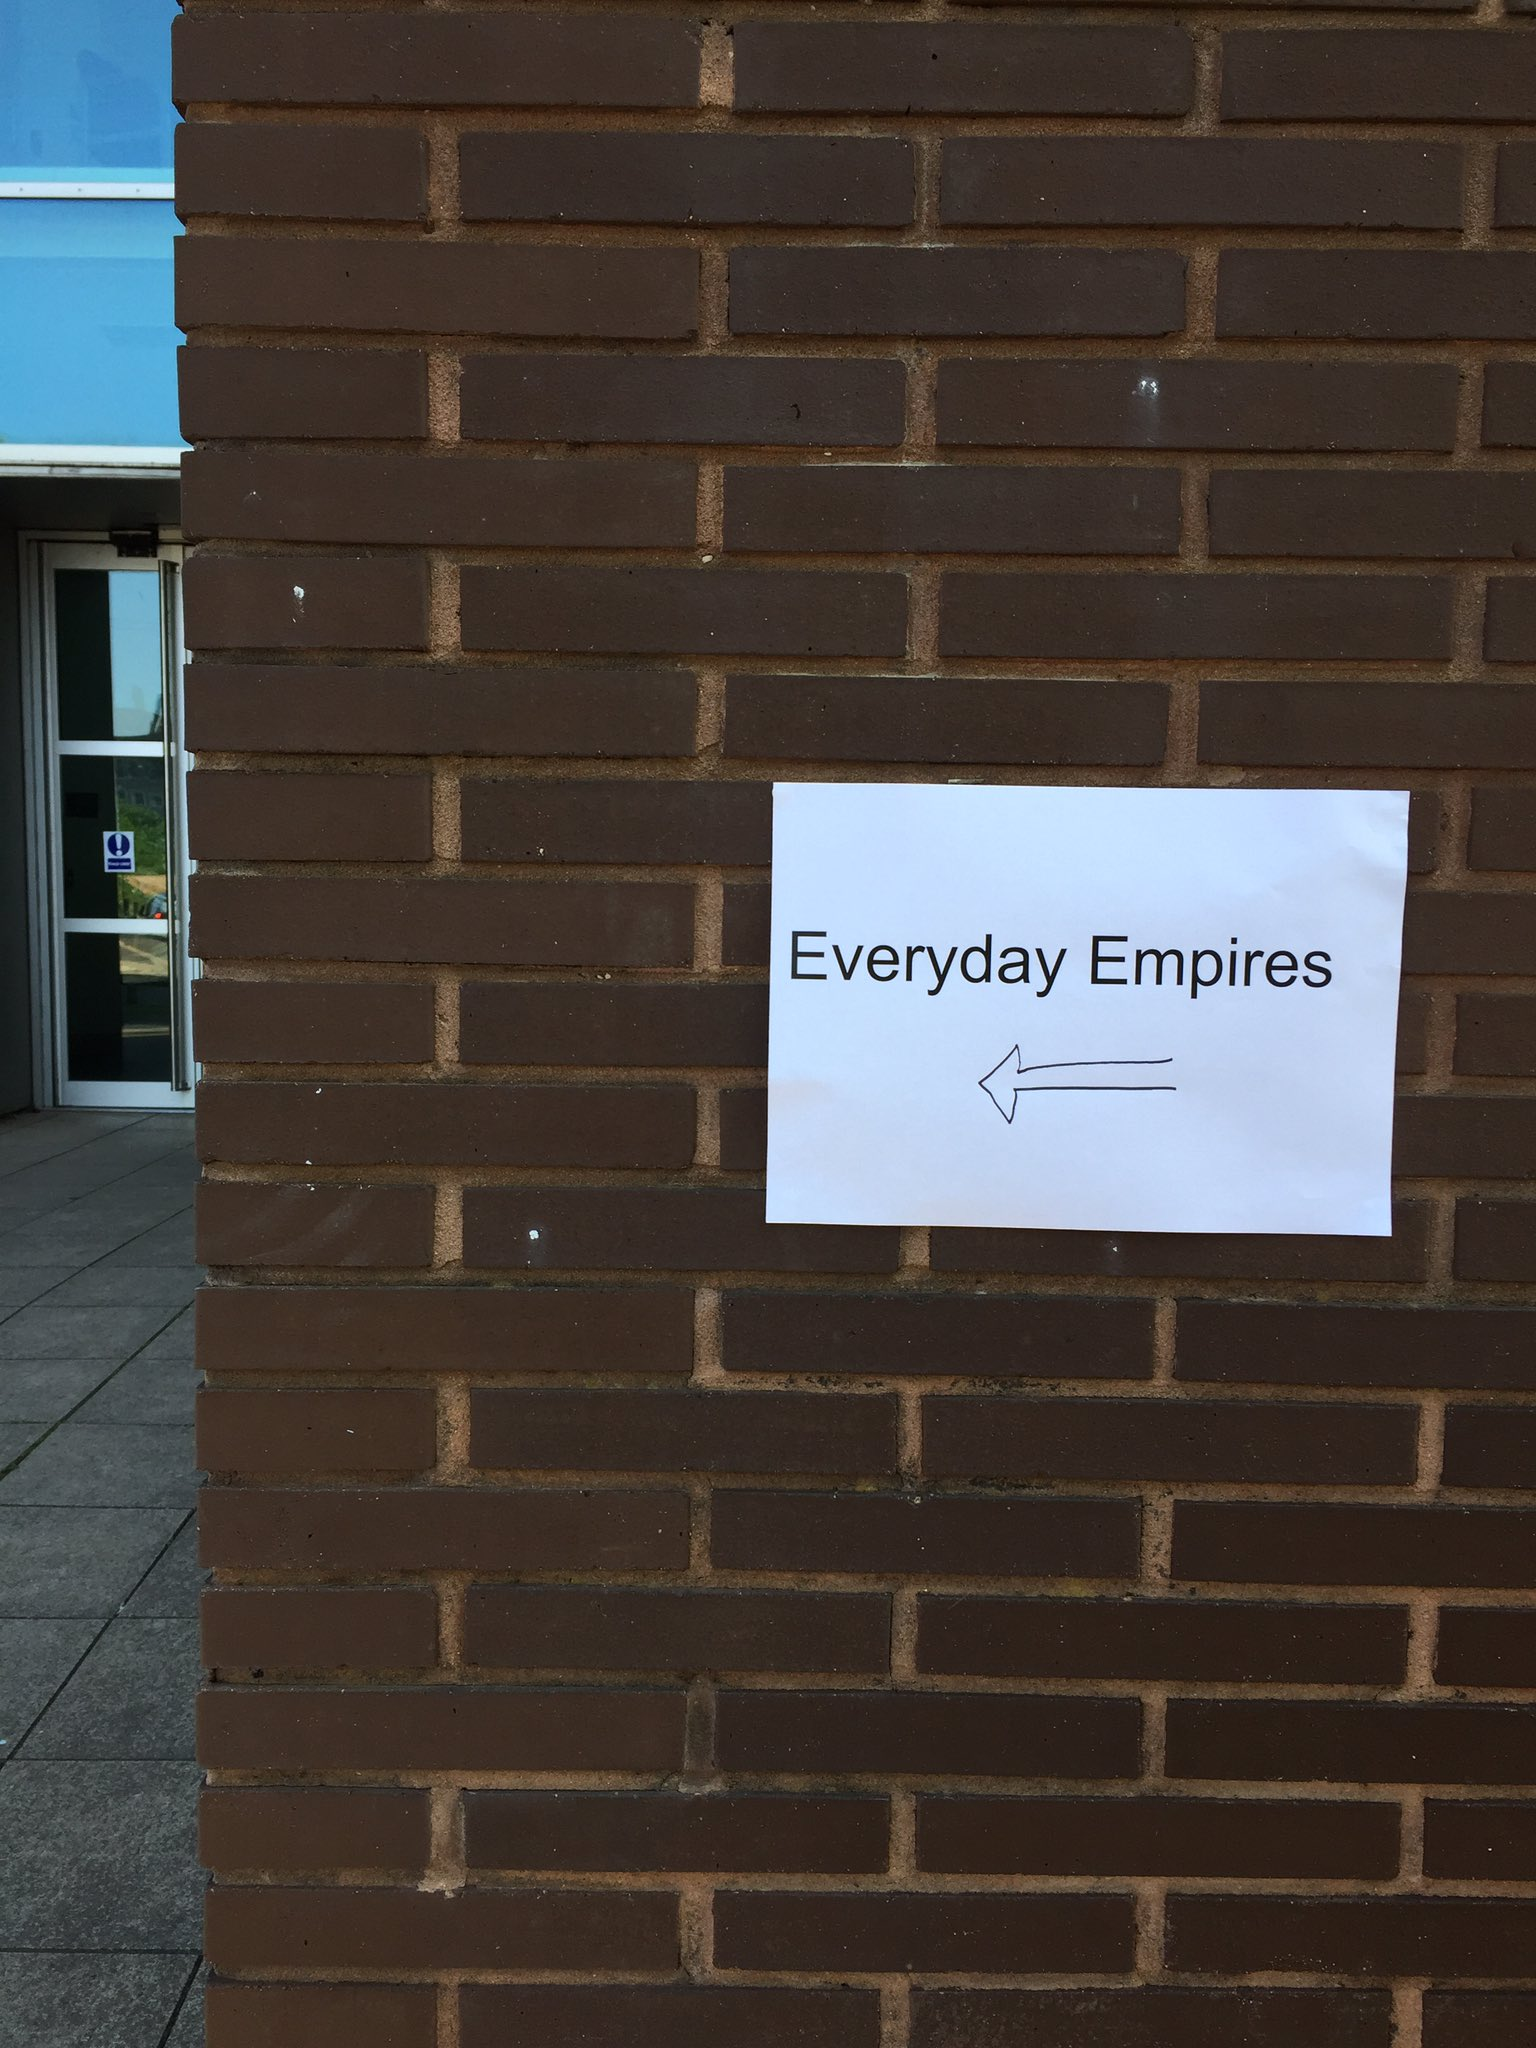 It's on! #EverydayEmpires @theBRIHC @modcontempbham @PastPresentSoc @History_Bham @ExeterCIGH @CJCampbell123 @MBSBirmingham https://t.co/TiIVZe7qEE